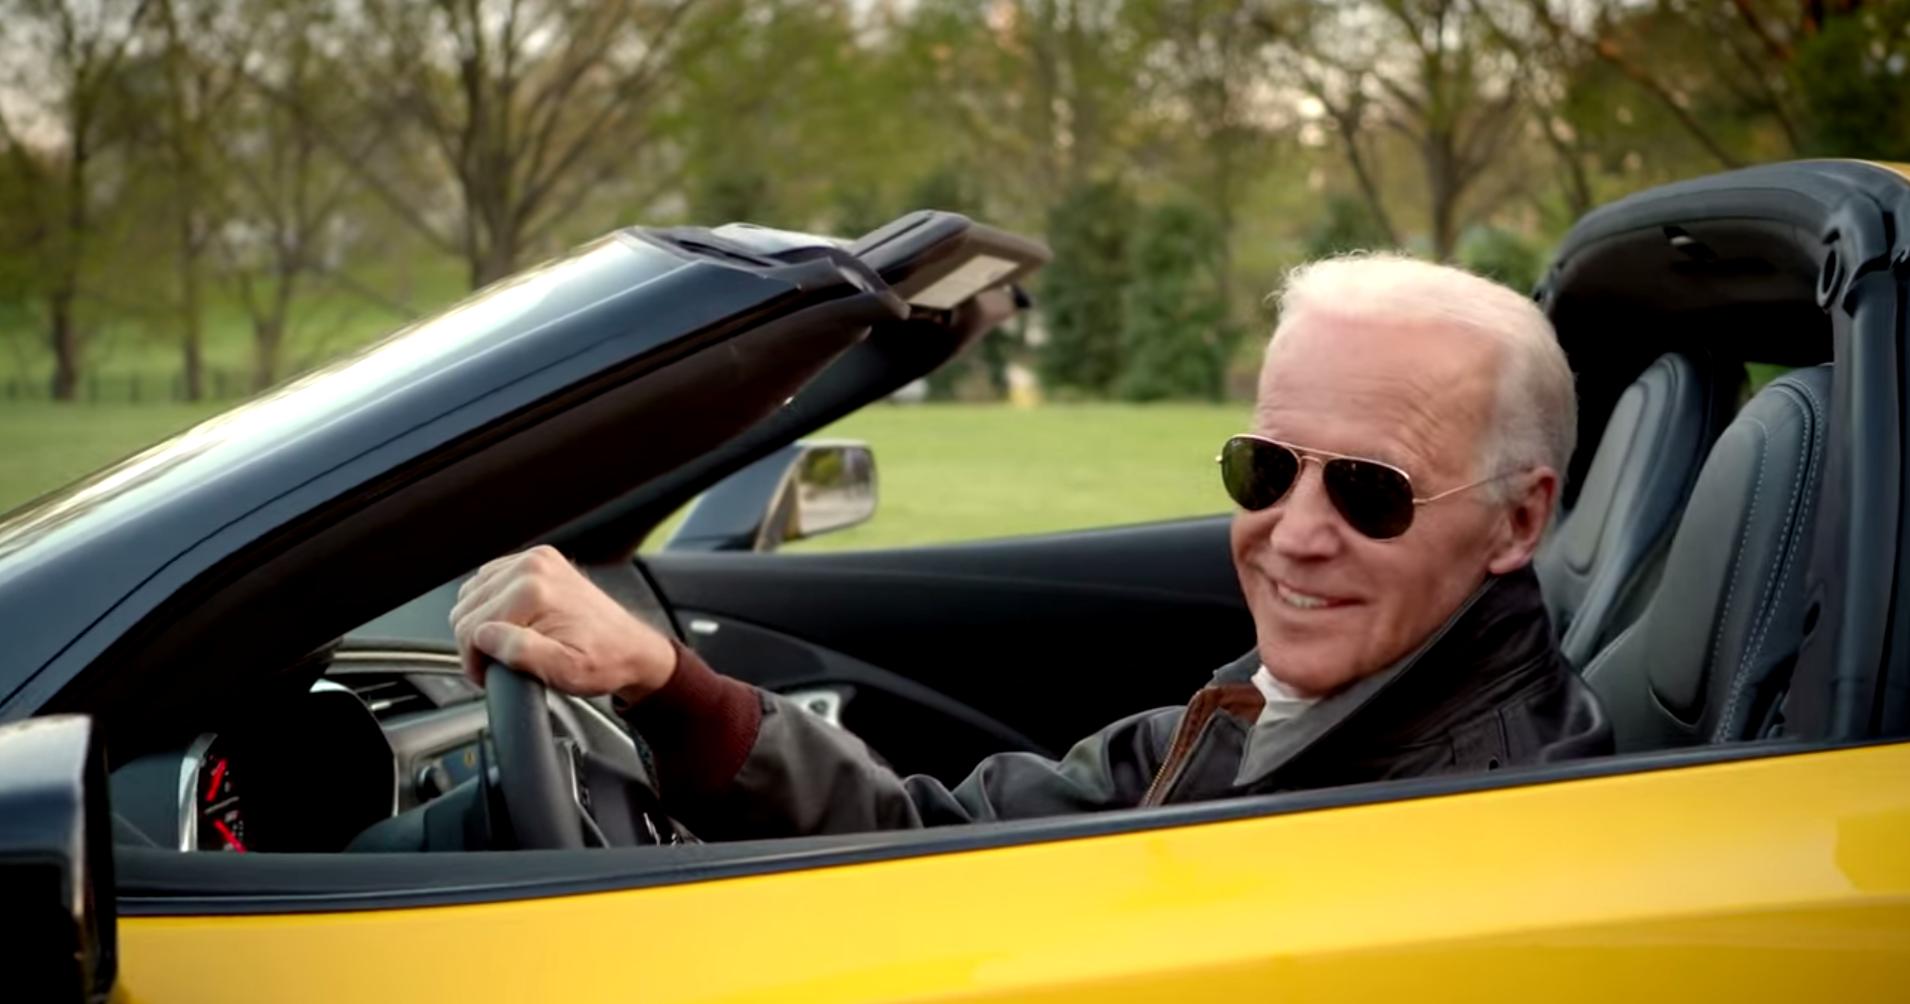 Joe Biden In A Yellow C7 Corvette Stingray The News Wheel